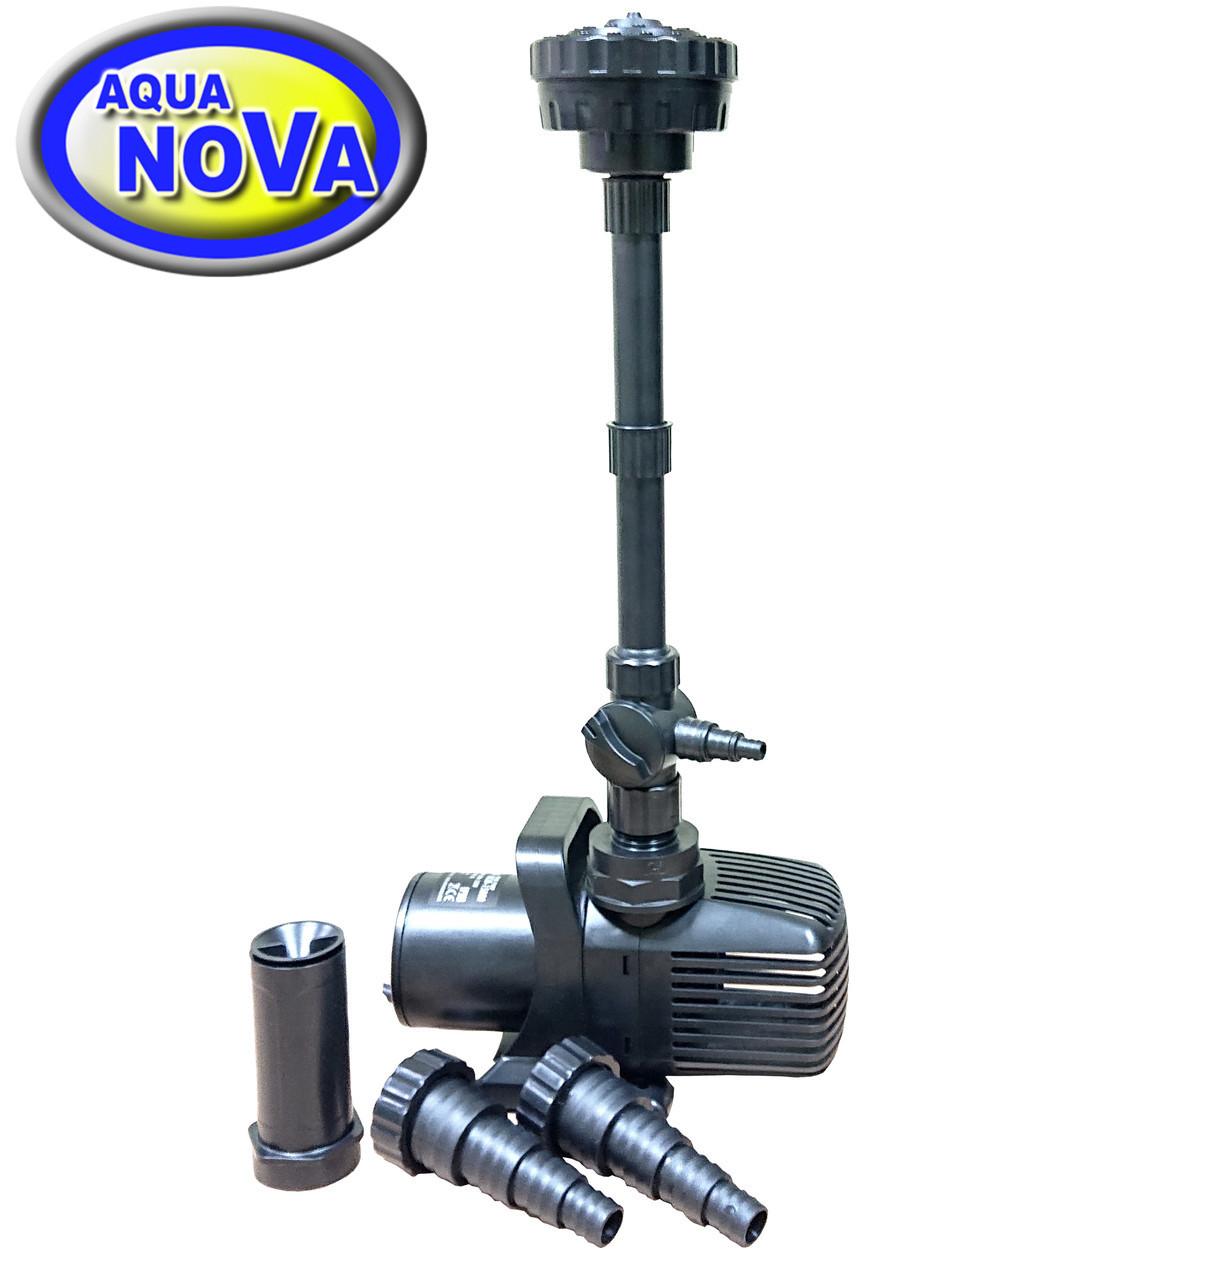 Насос для пруда AquaNova NCM-13000 л/час Fountain